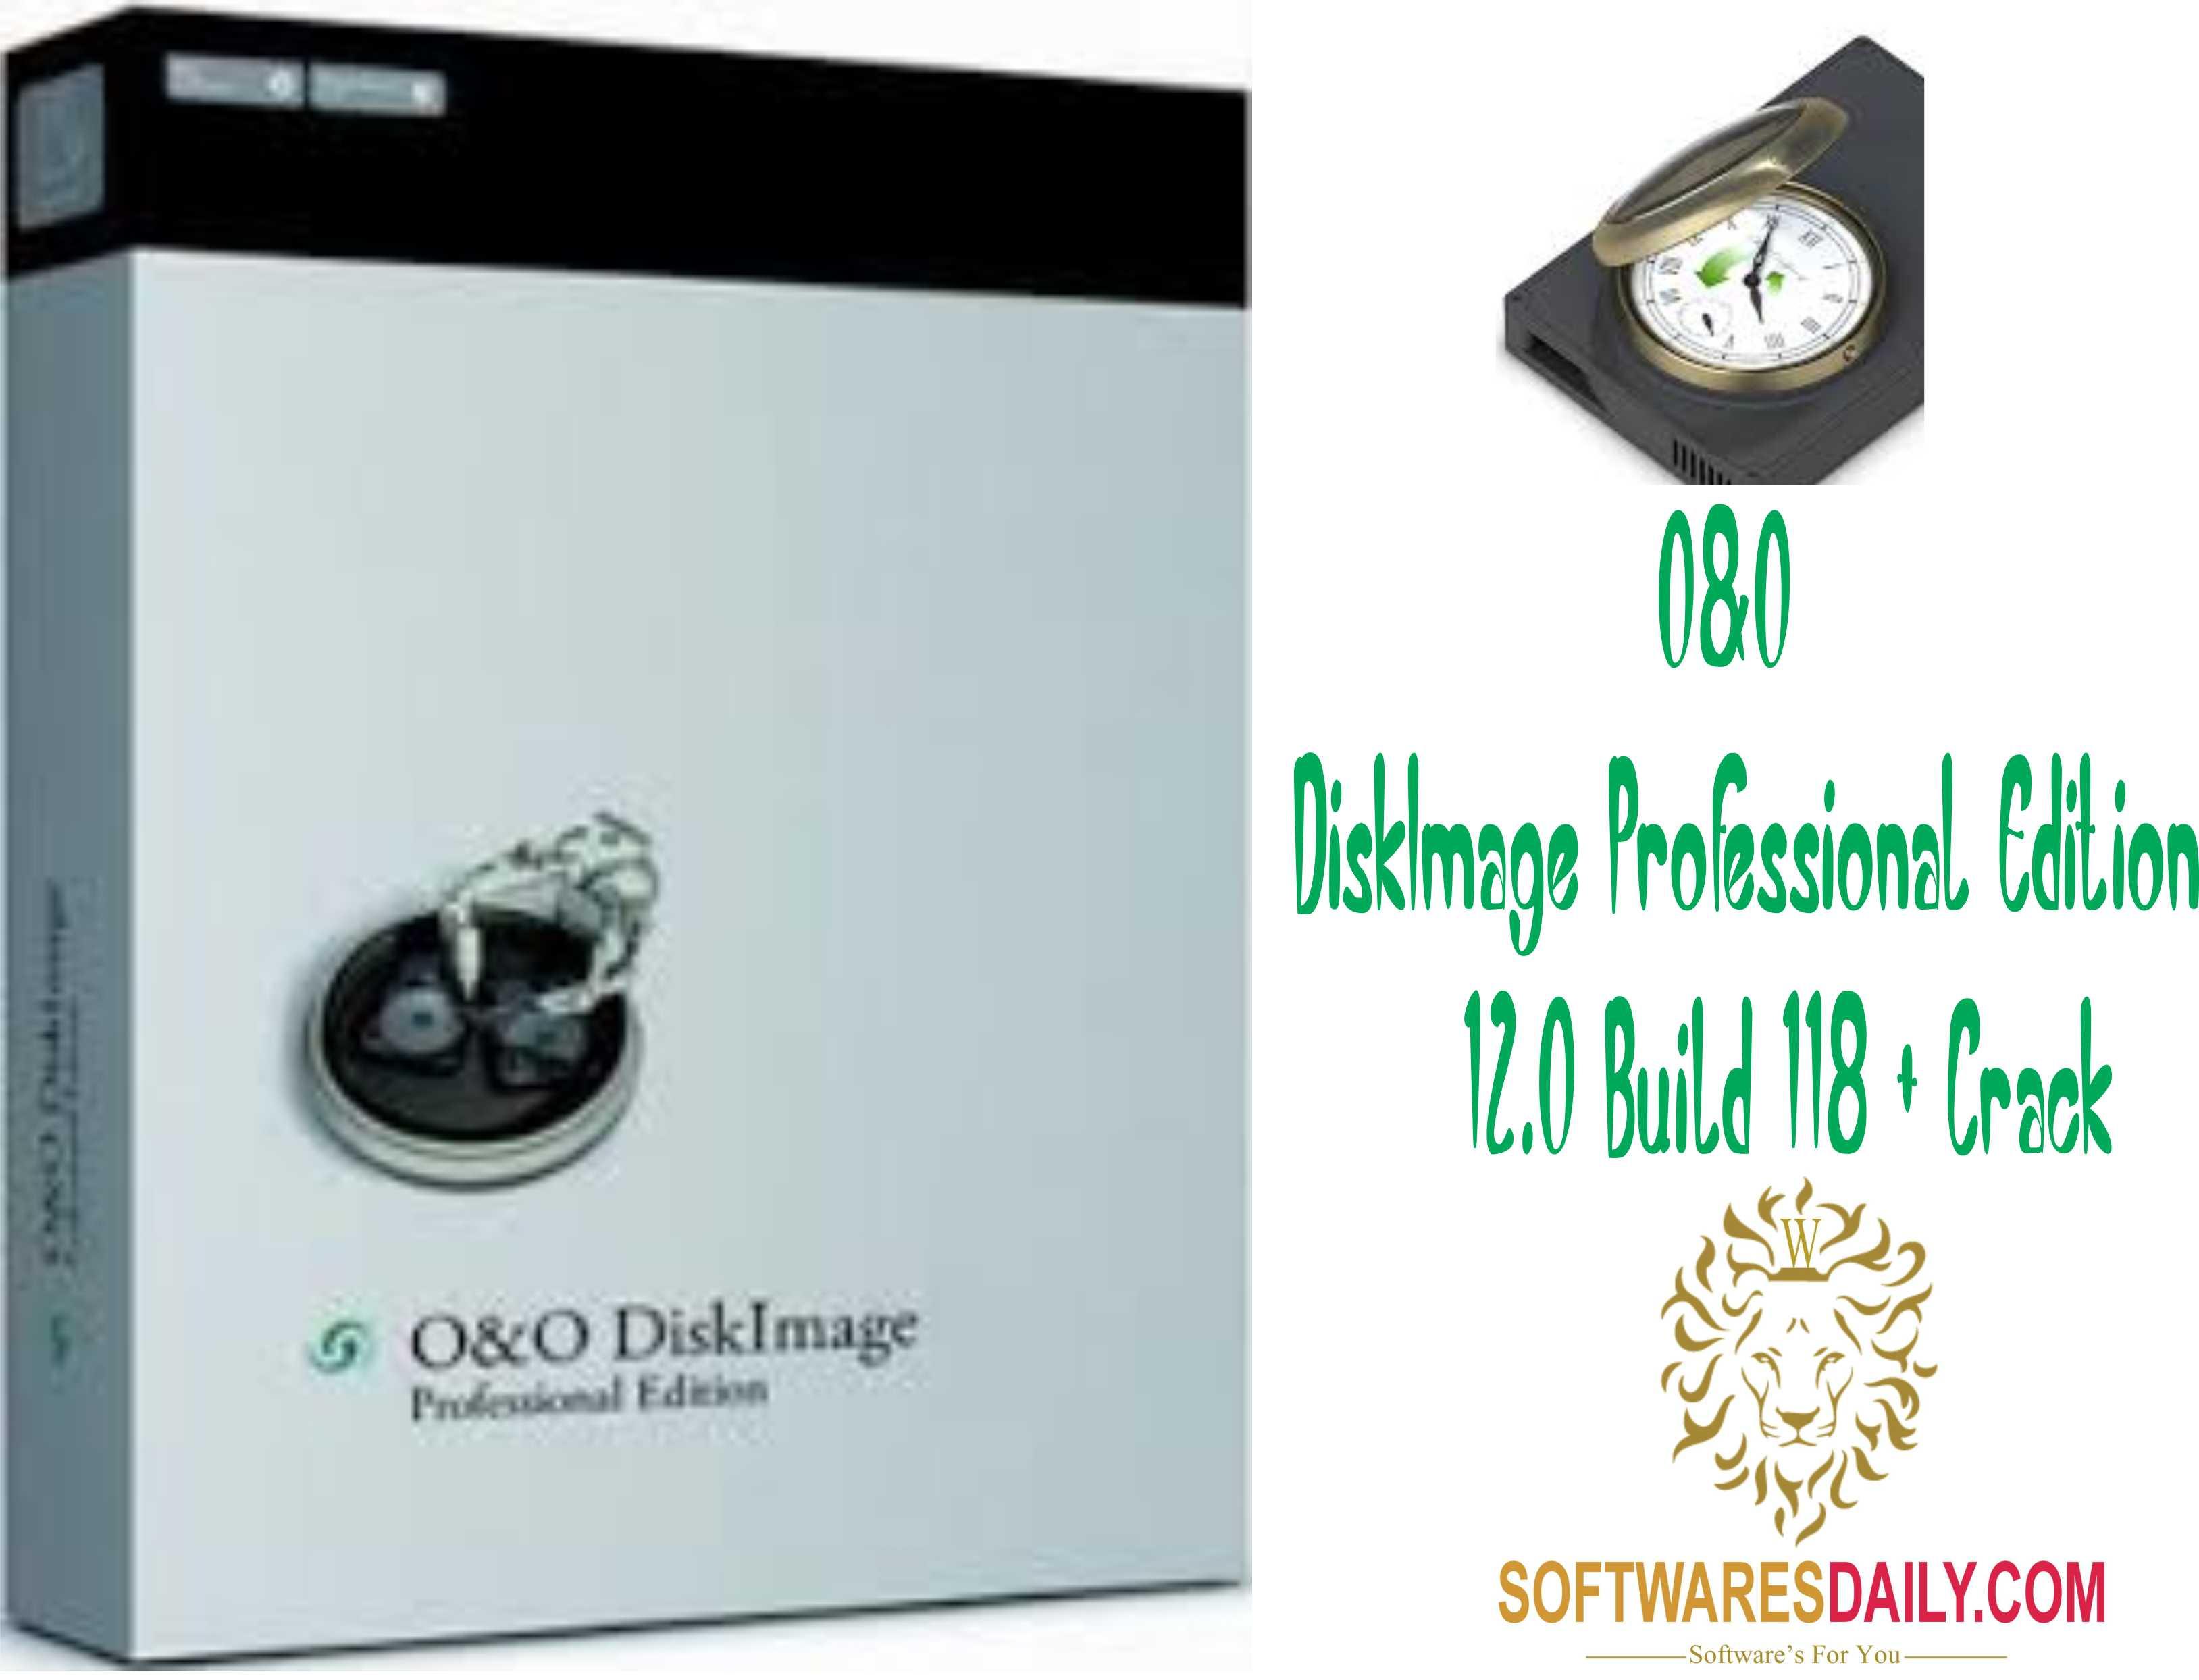 O&O DiskImage Professional Edition 12.0 Build 118 + Crack